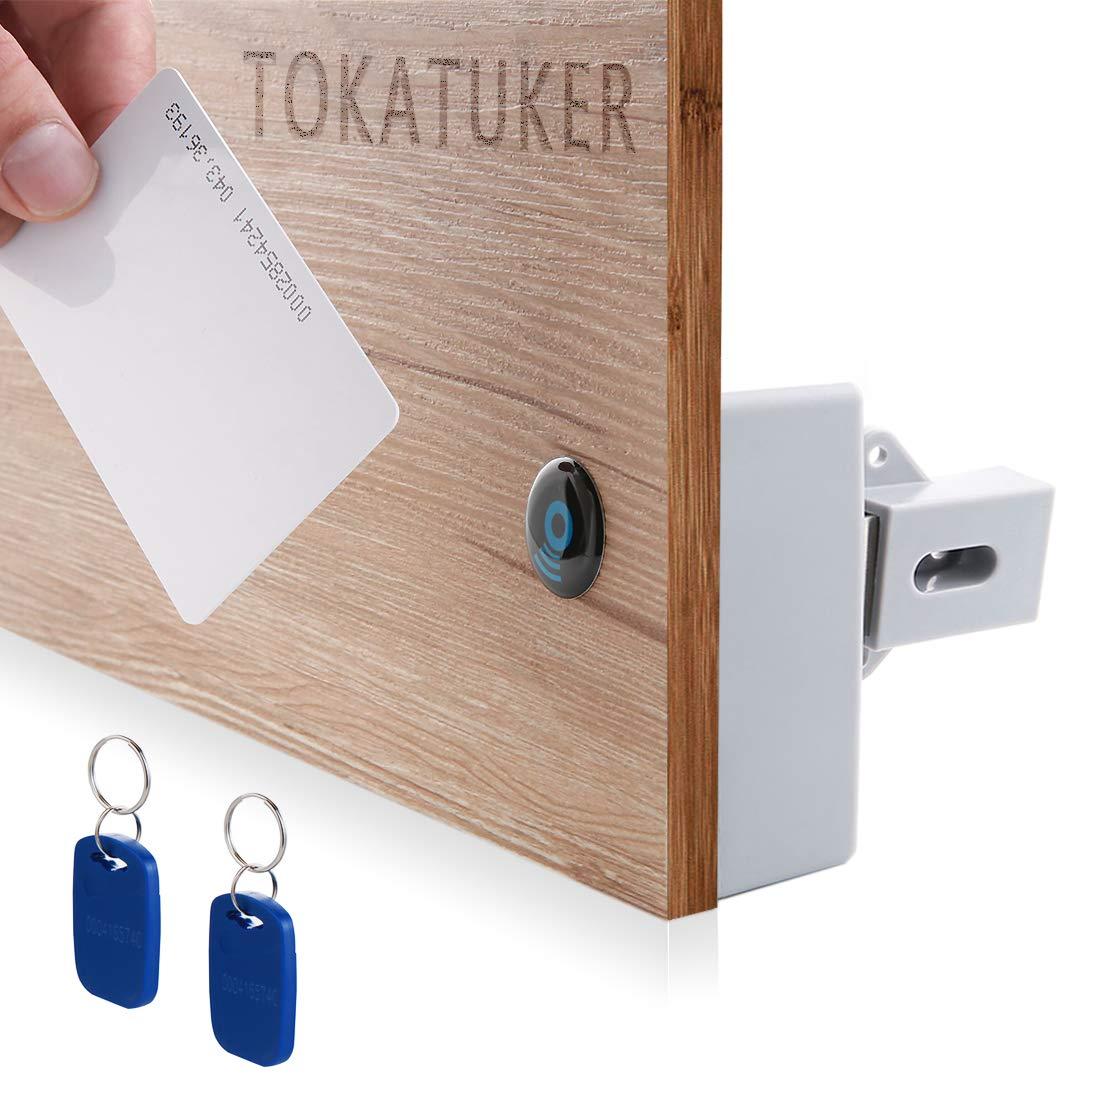 Tokatuker Rfid Electronic Cabinet Lock Hidden Diy For